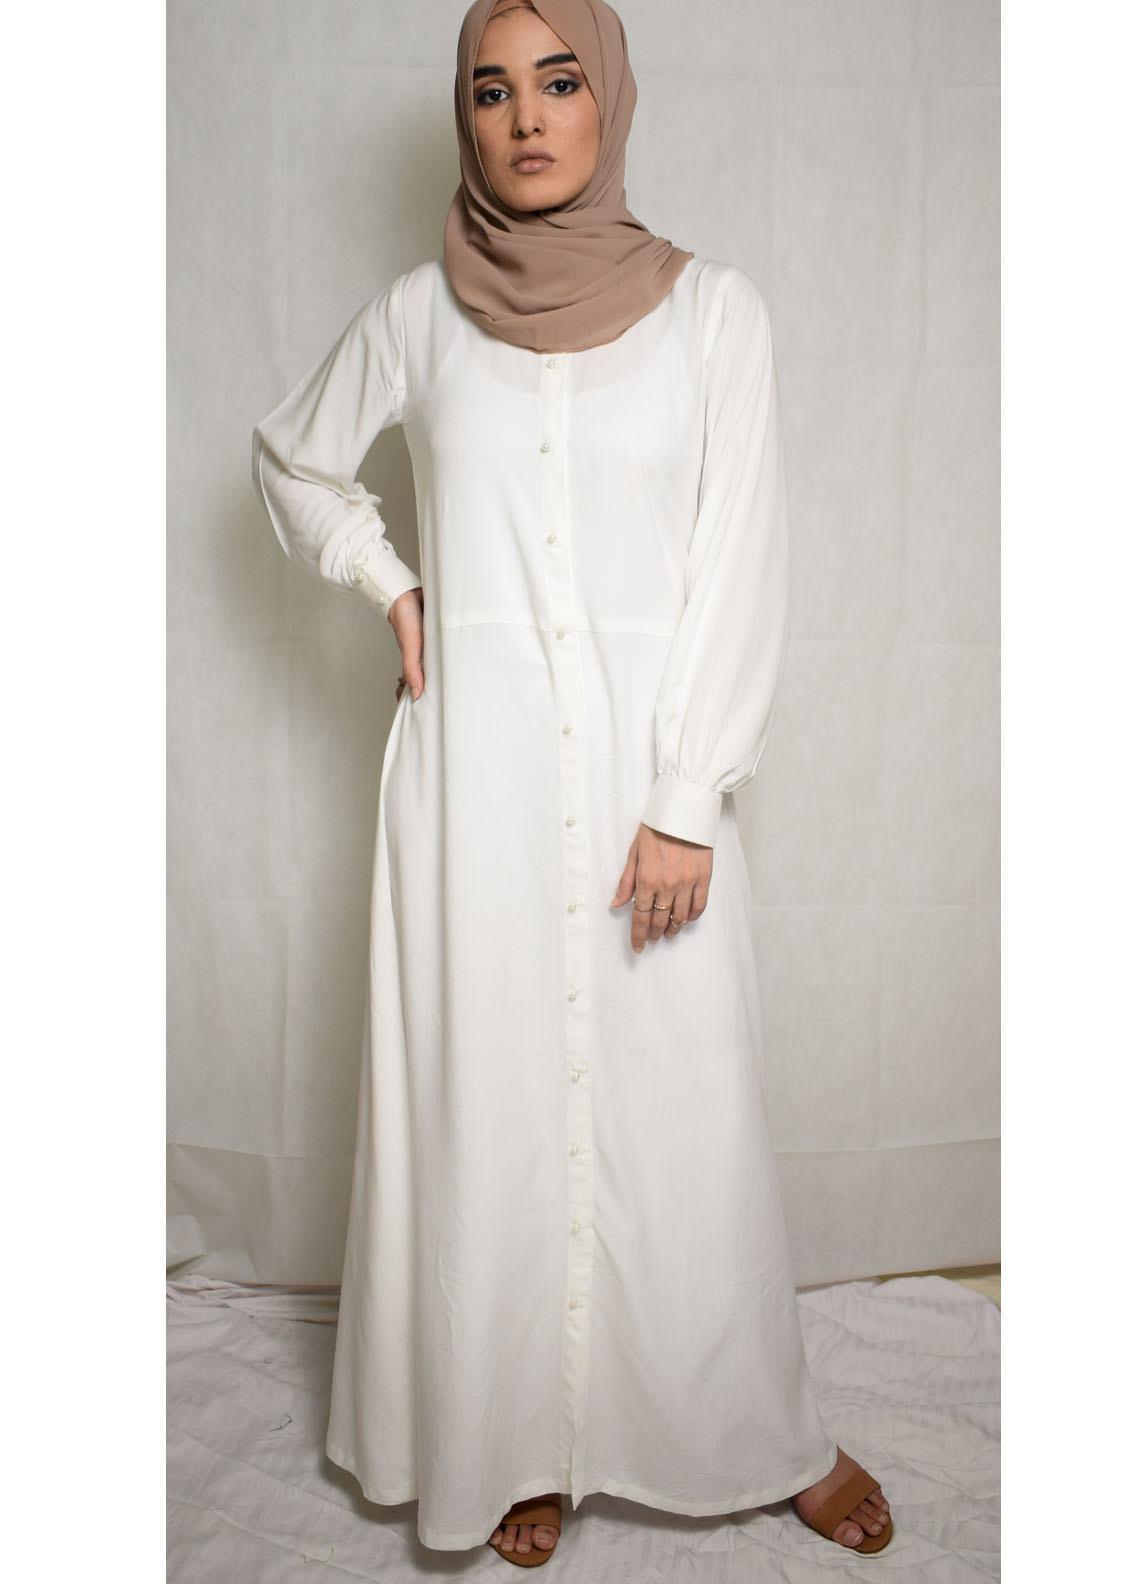 Nida Gul Fancy Cotton Stitched Maxi NG20MD D-302 Adara Maxi Dress with Hijab